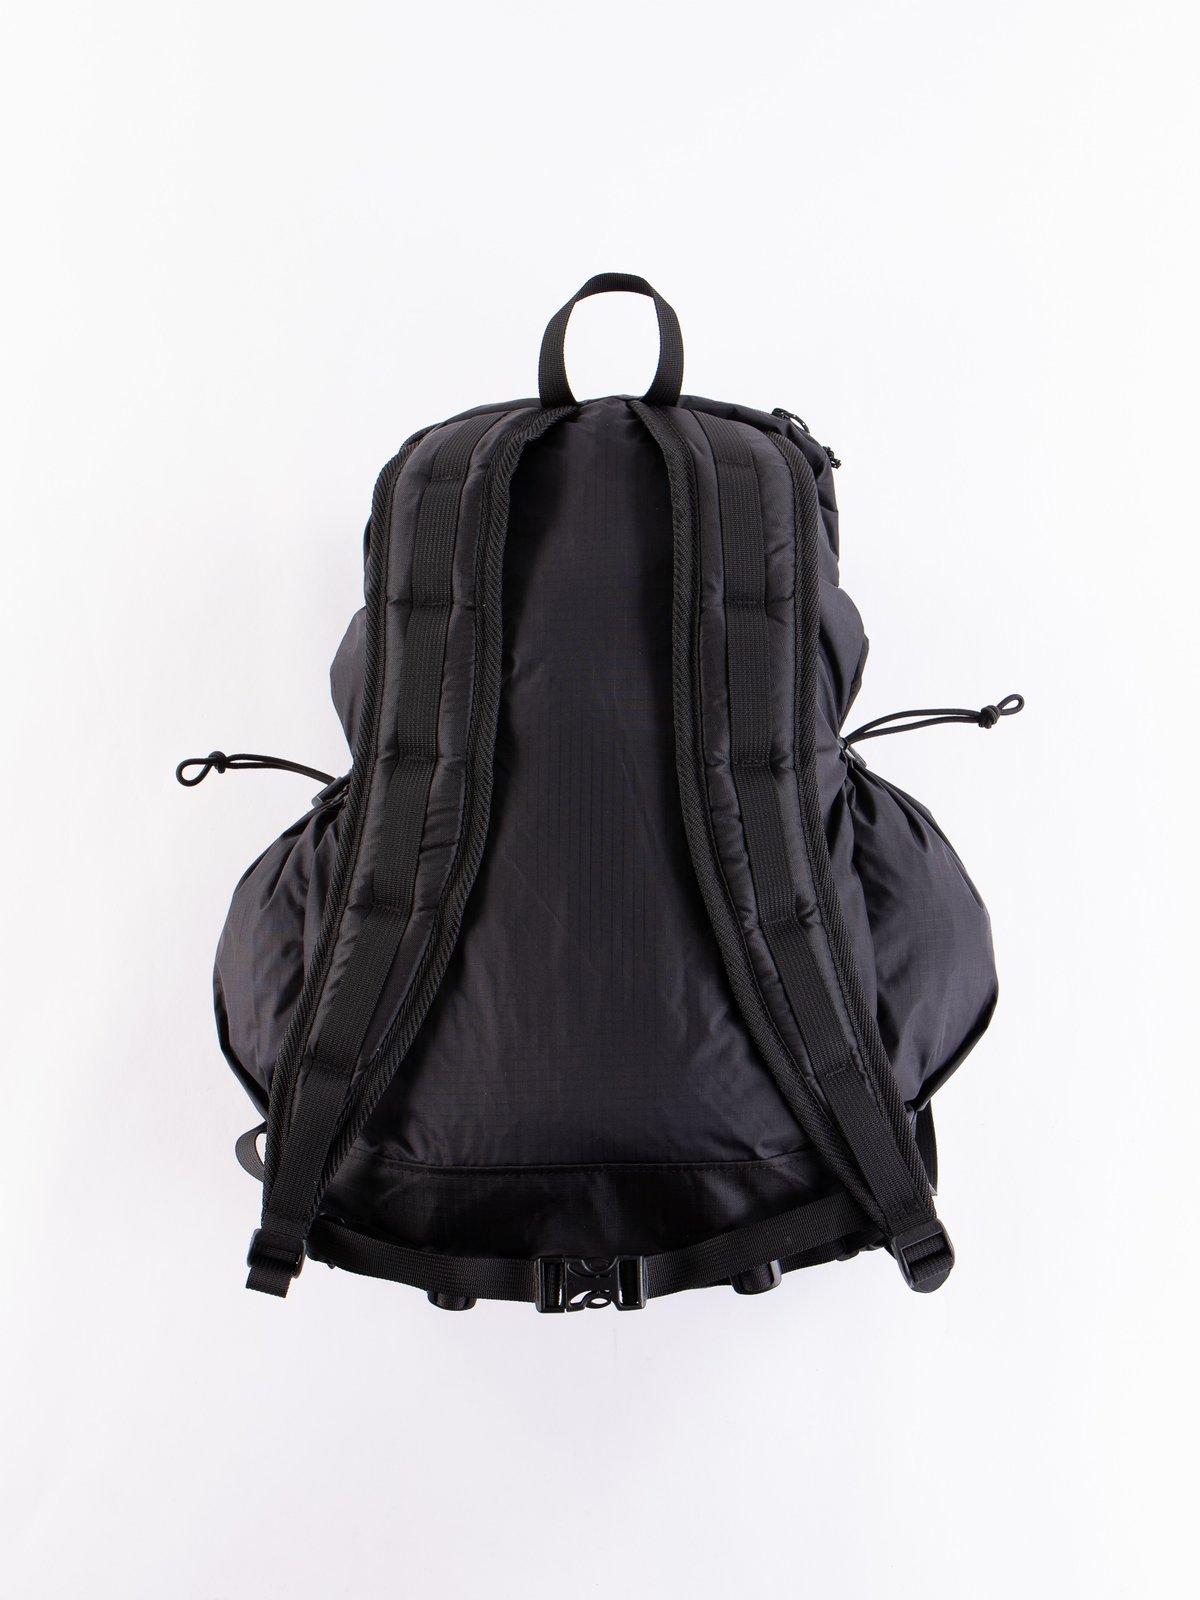 Black Nylon Ripstop UL Backpack - Image 3